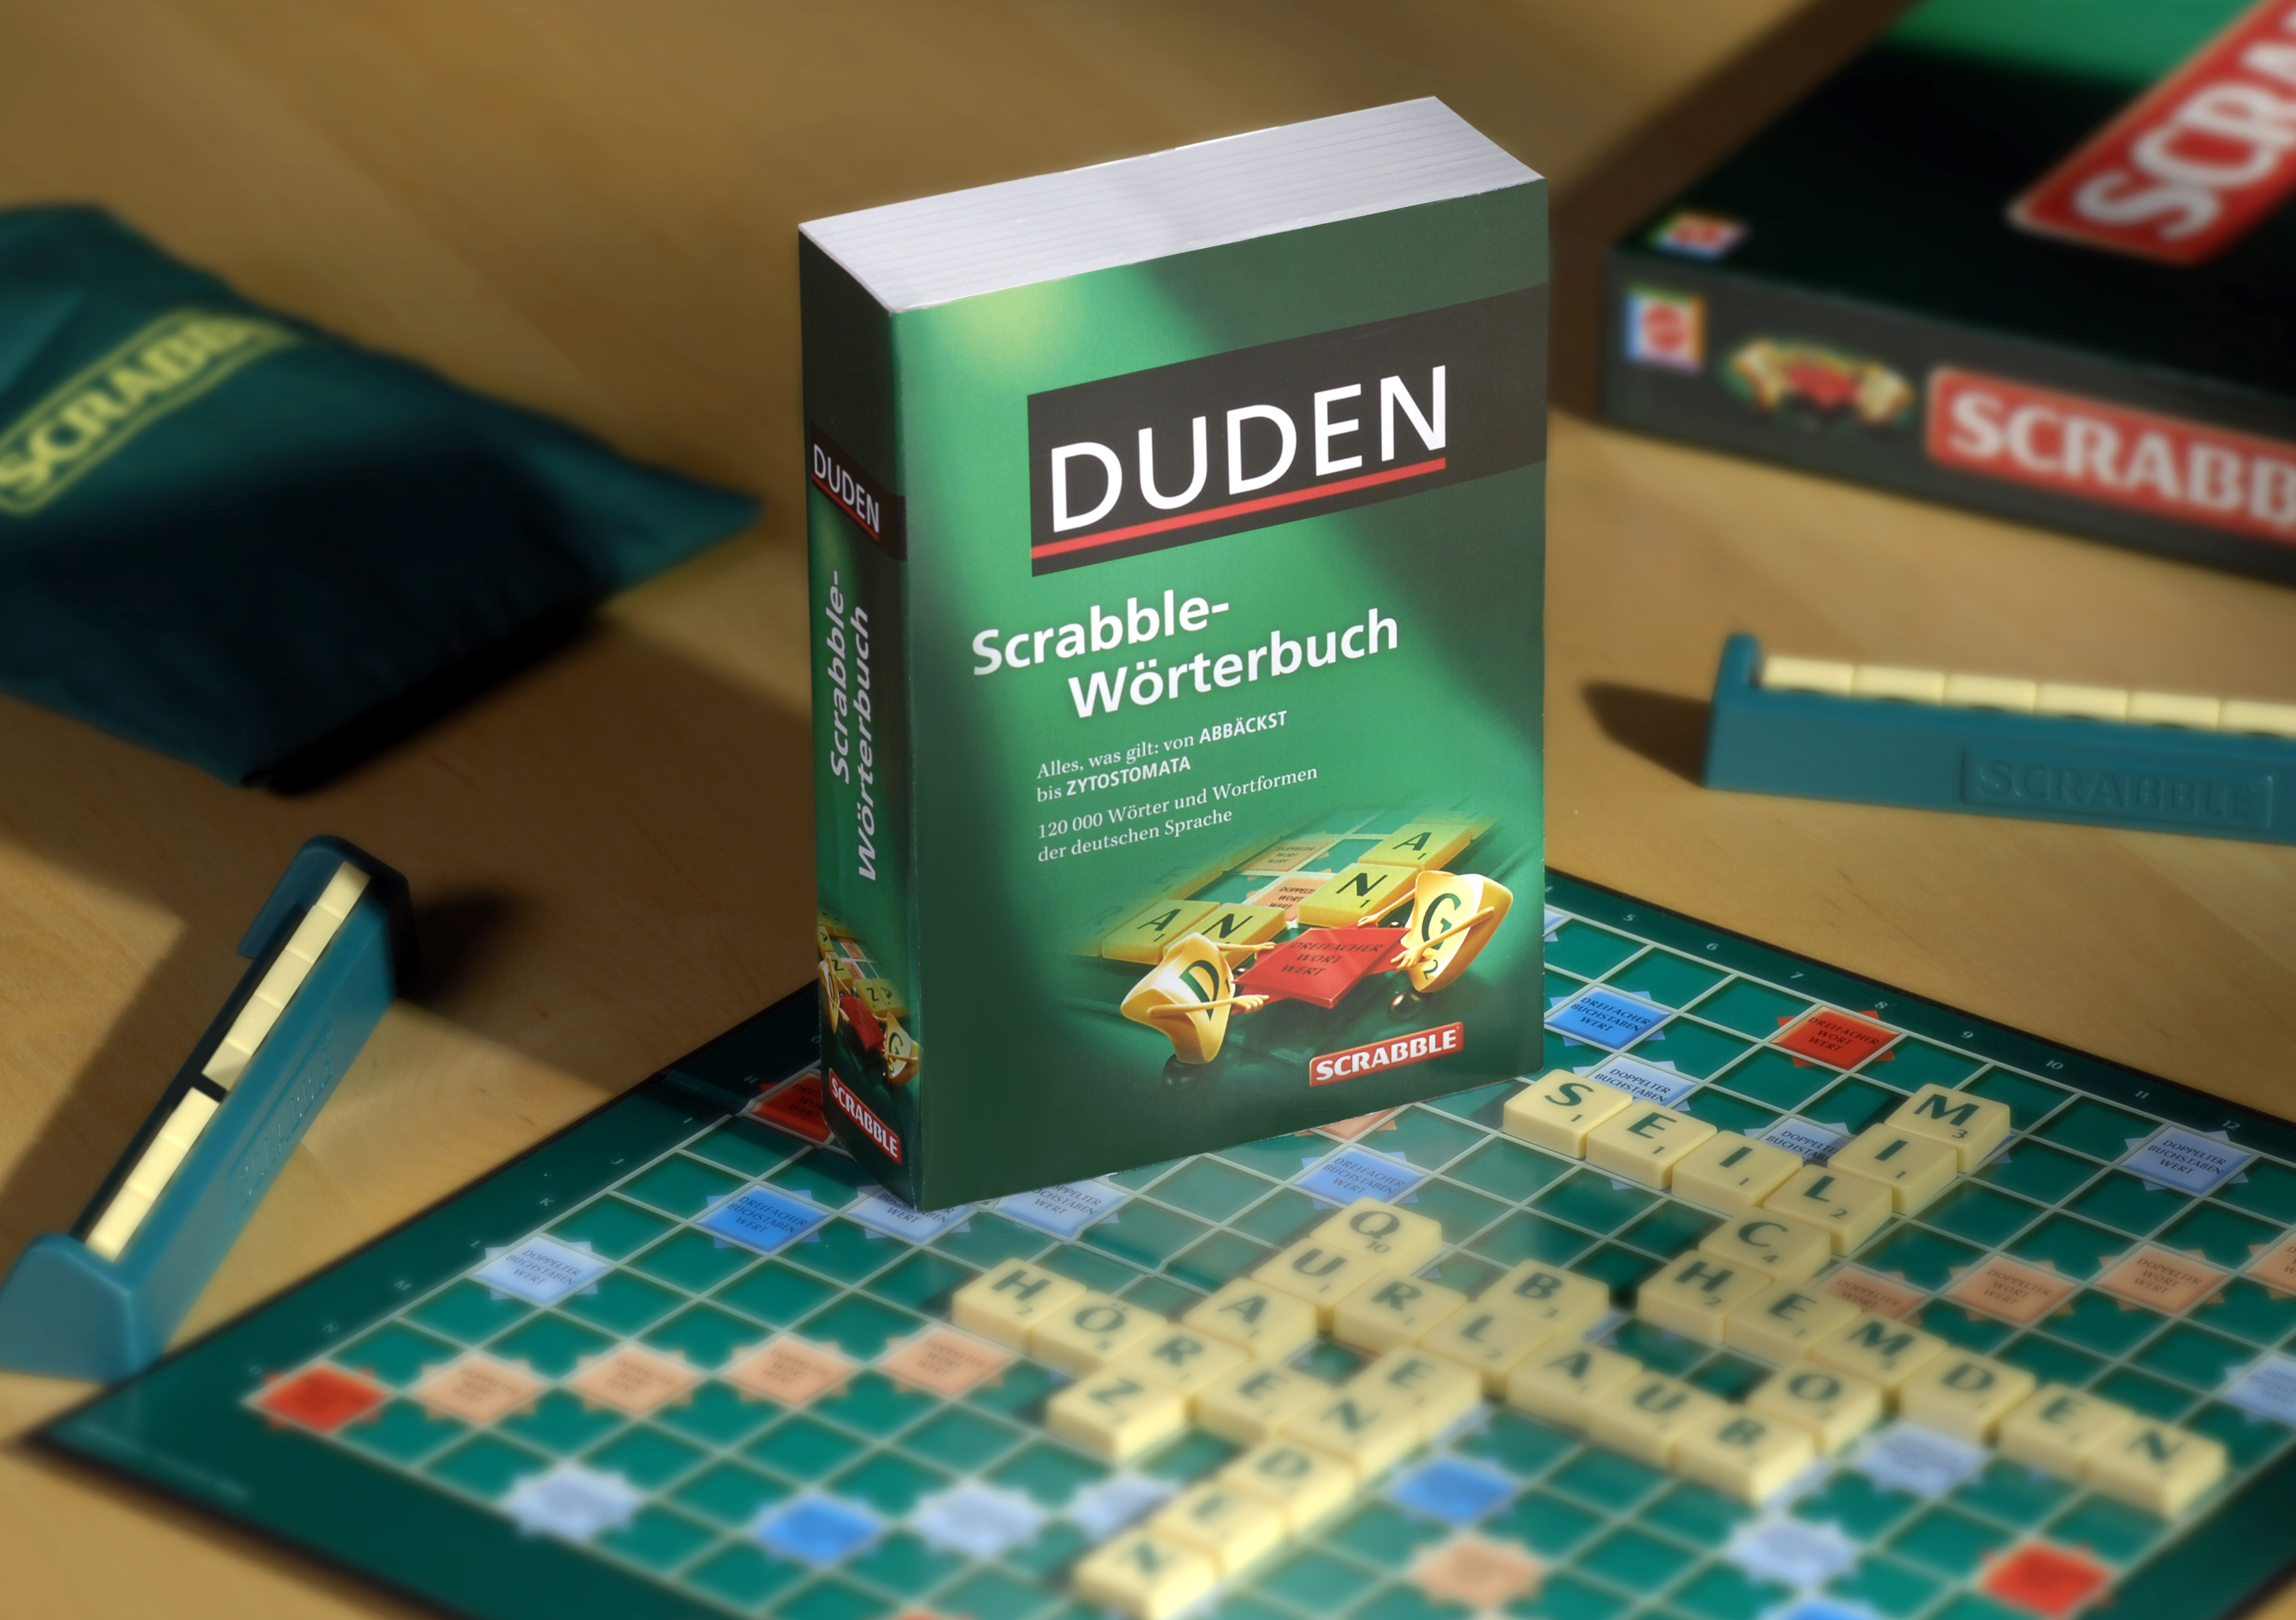 Wörterbuch Scrabble